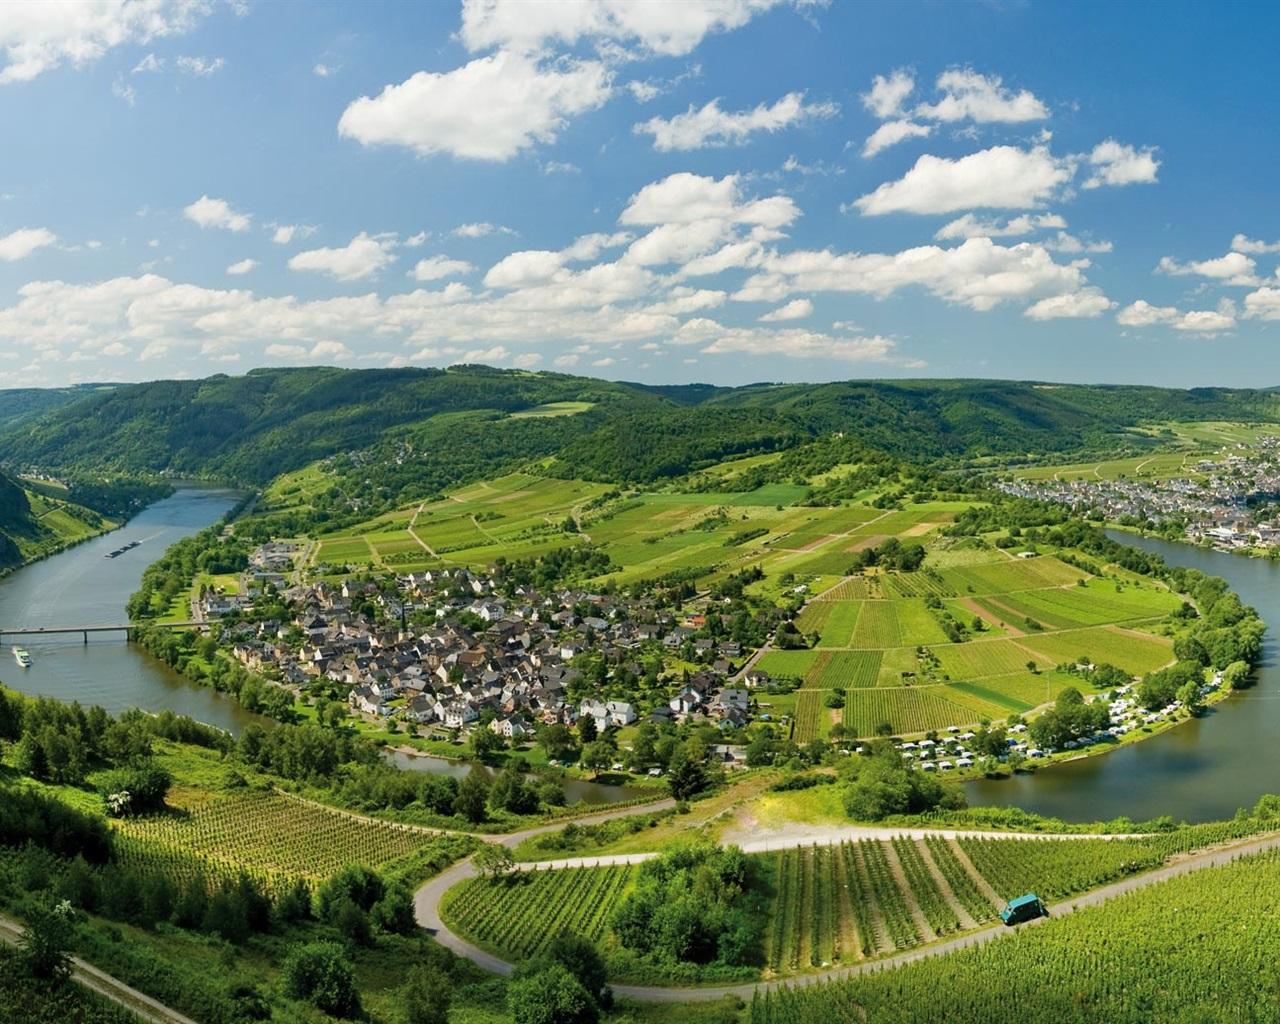 Lorch Village, Hesse, Rhine River, Germany  № 78269  скачать